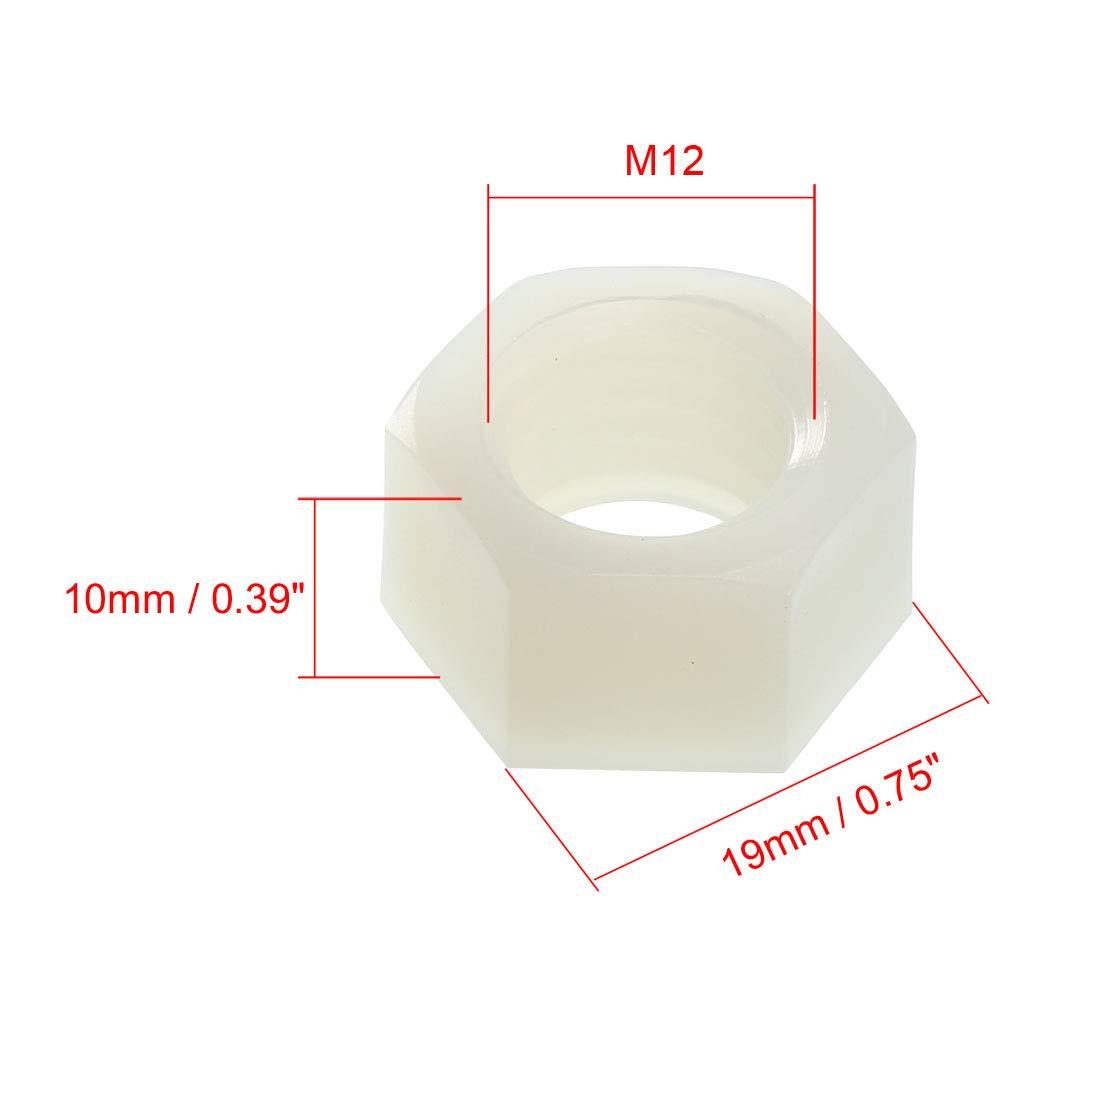 uxcell Hex Nut Metric Nylon M8x1.25mm Thread Hexagon Nuts Black 25pcs